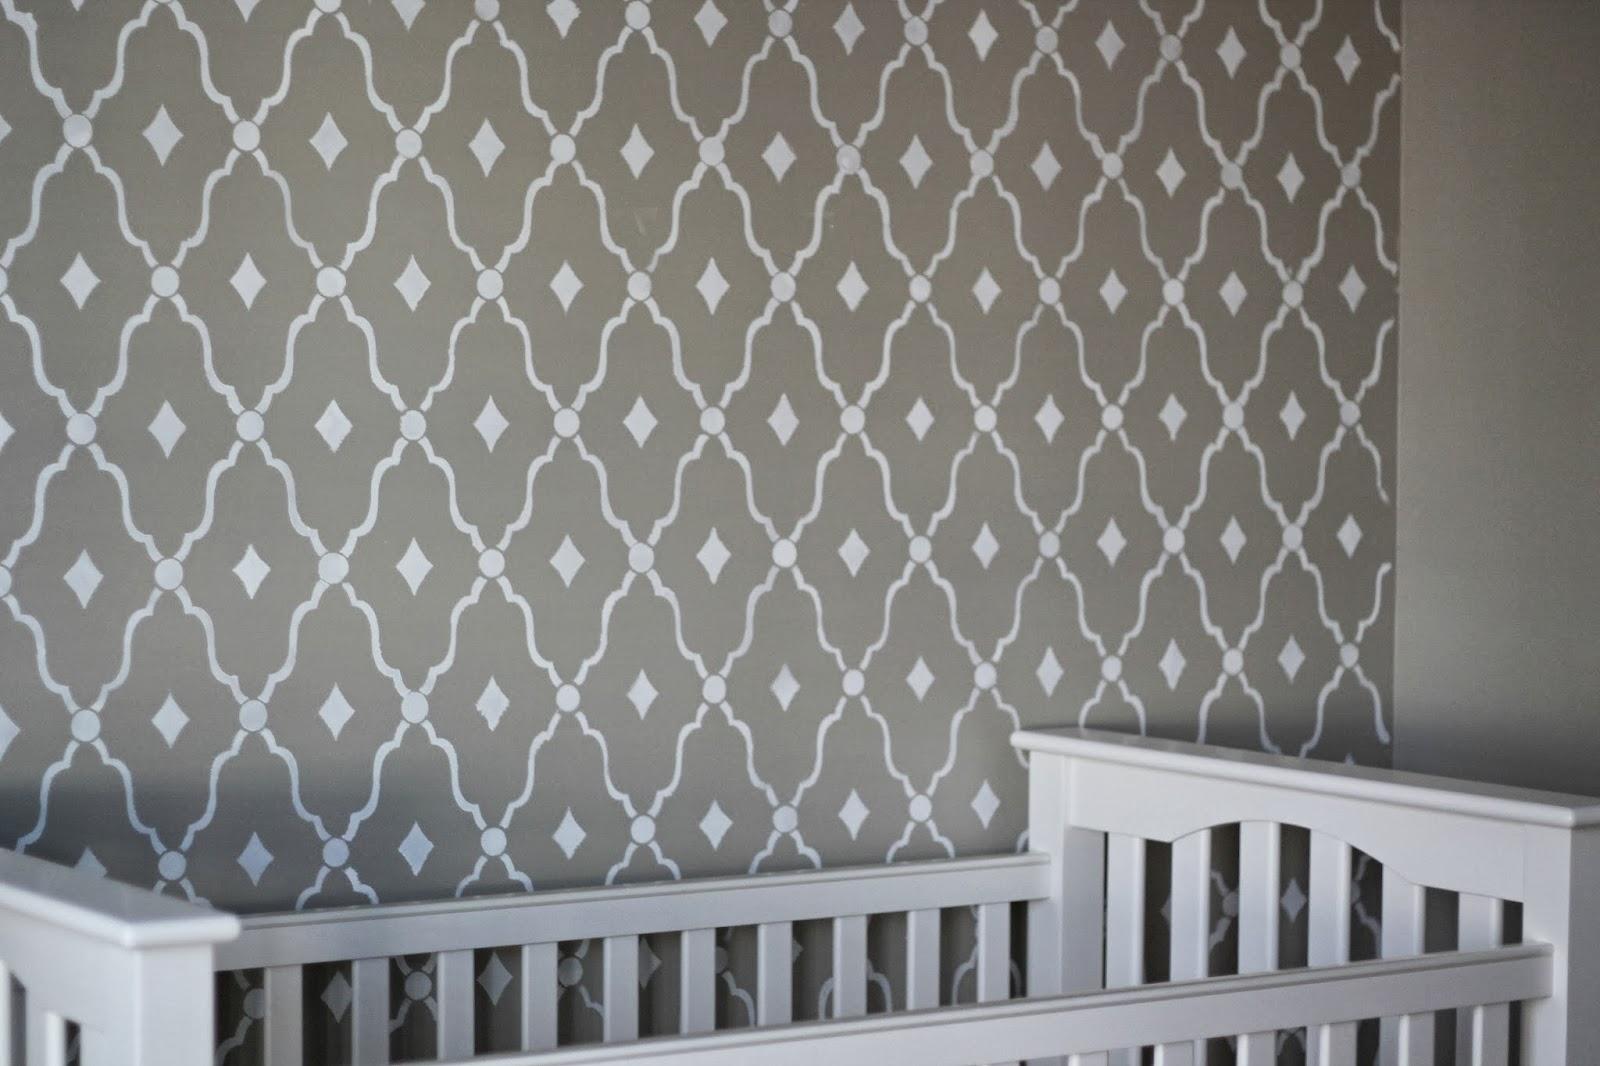 New Nursery Updates {DIY Stenciled Wall} - Carolina Charm UG17